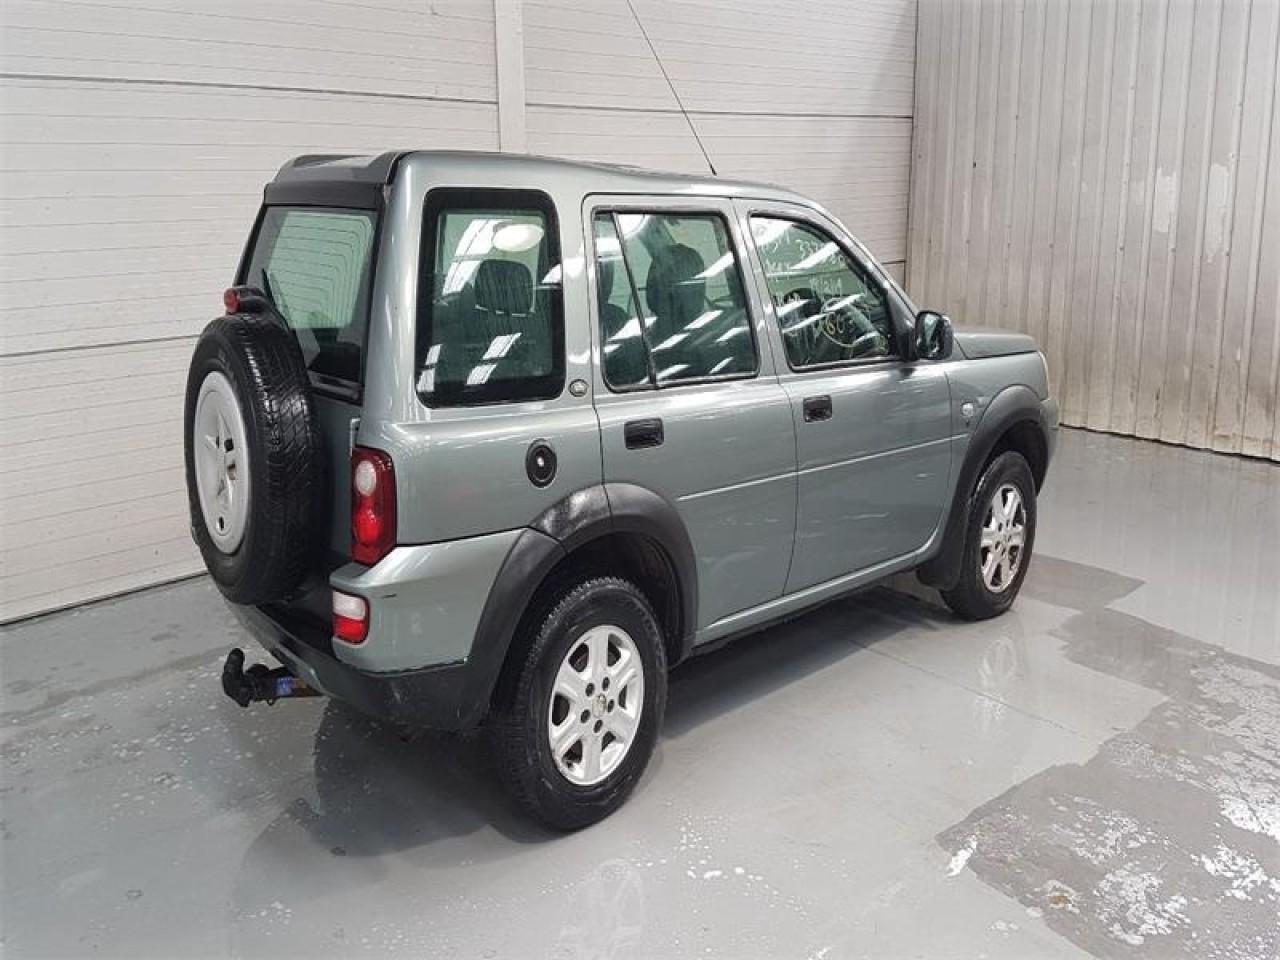 Set amortizoare fata Land Rover Freelander 2005 SUV 2.0d